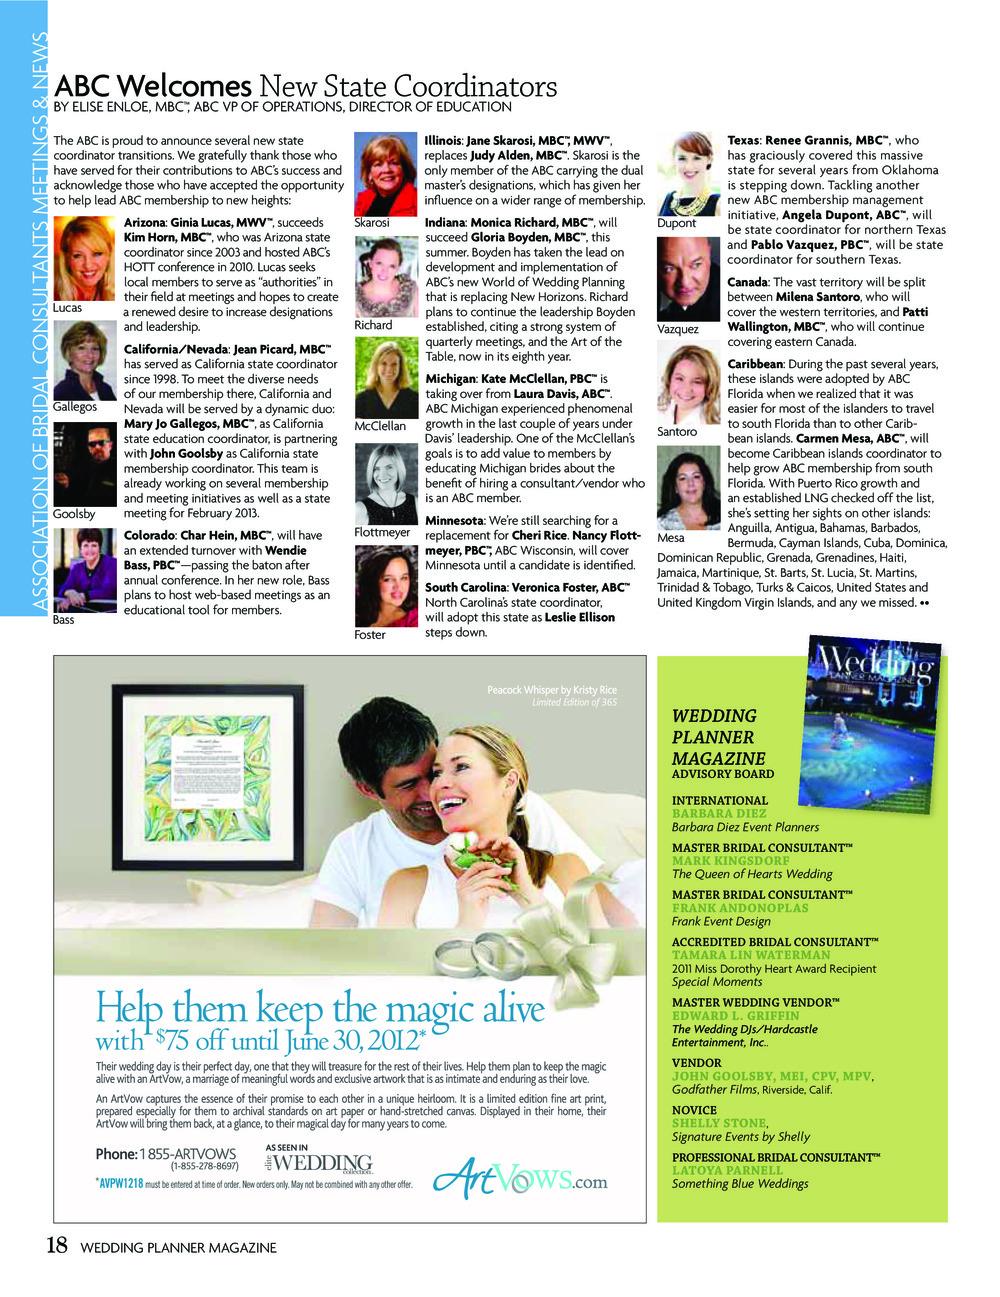 Wedding Planner Mag June 2012 Vol 2 Iss 2-page-17 (2).jpg